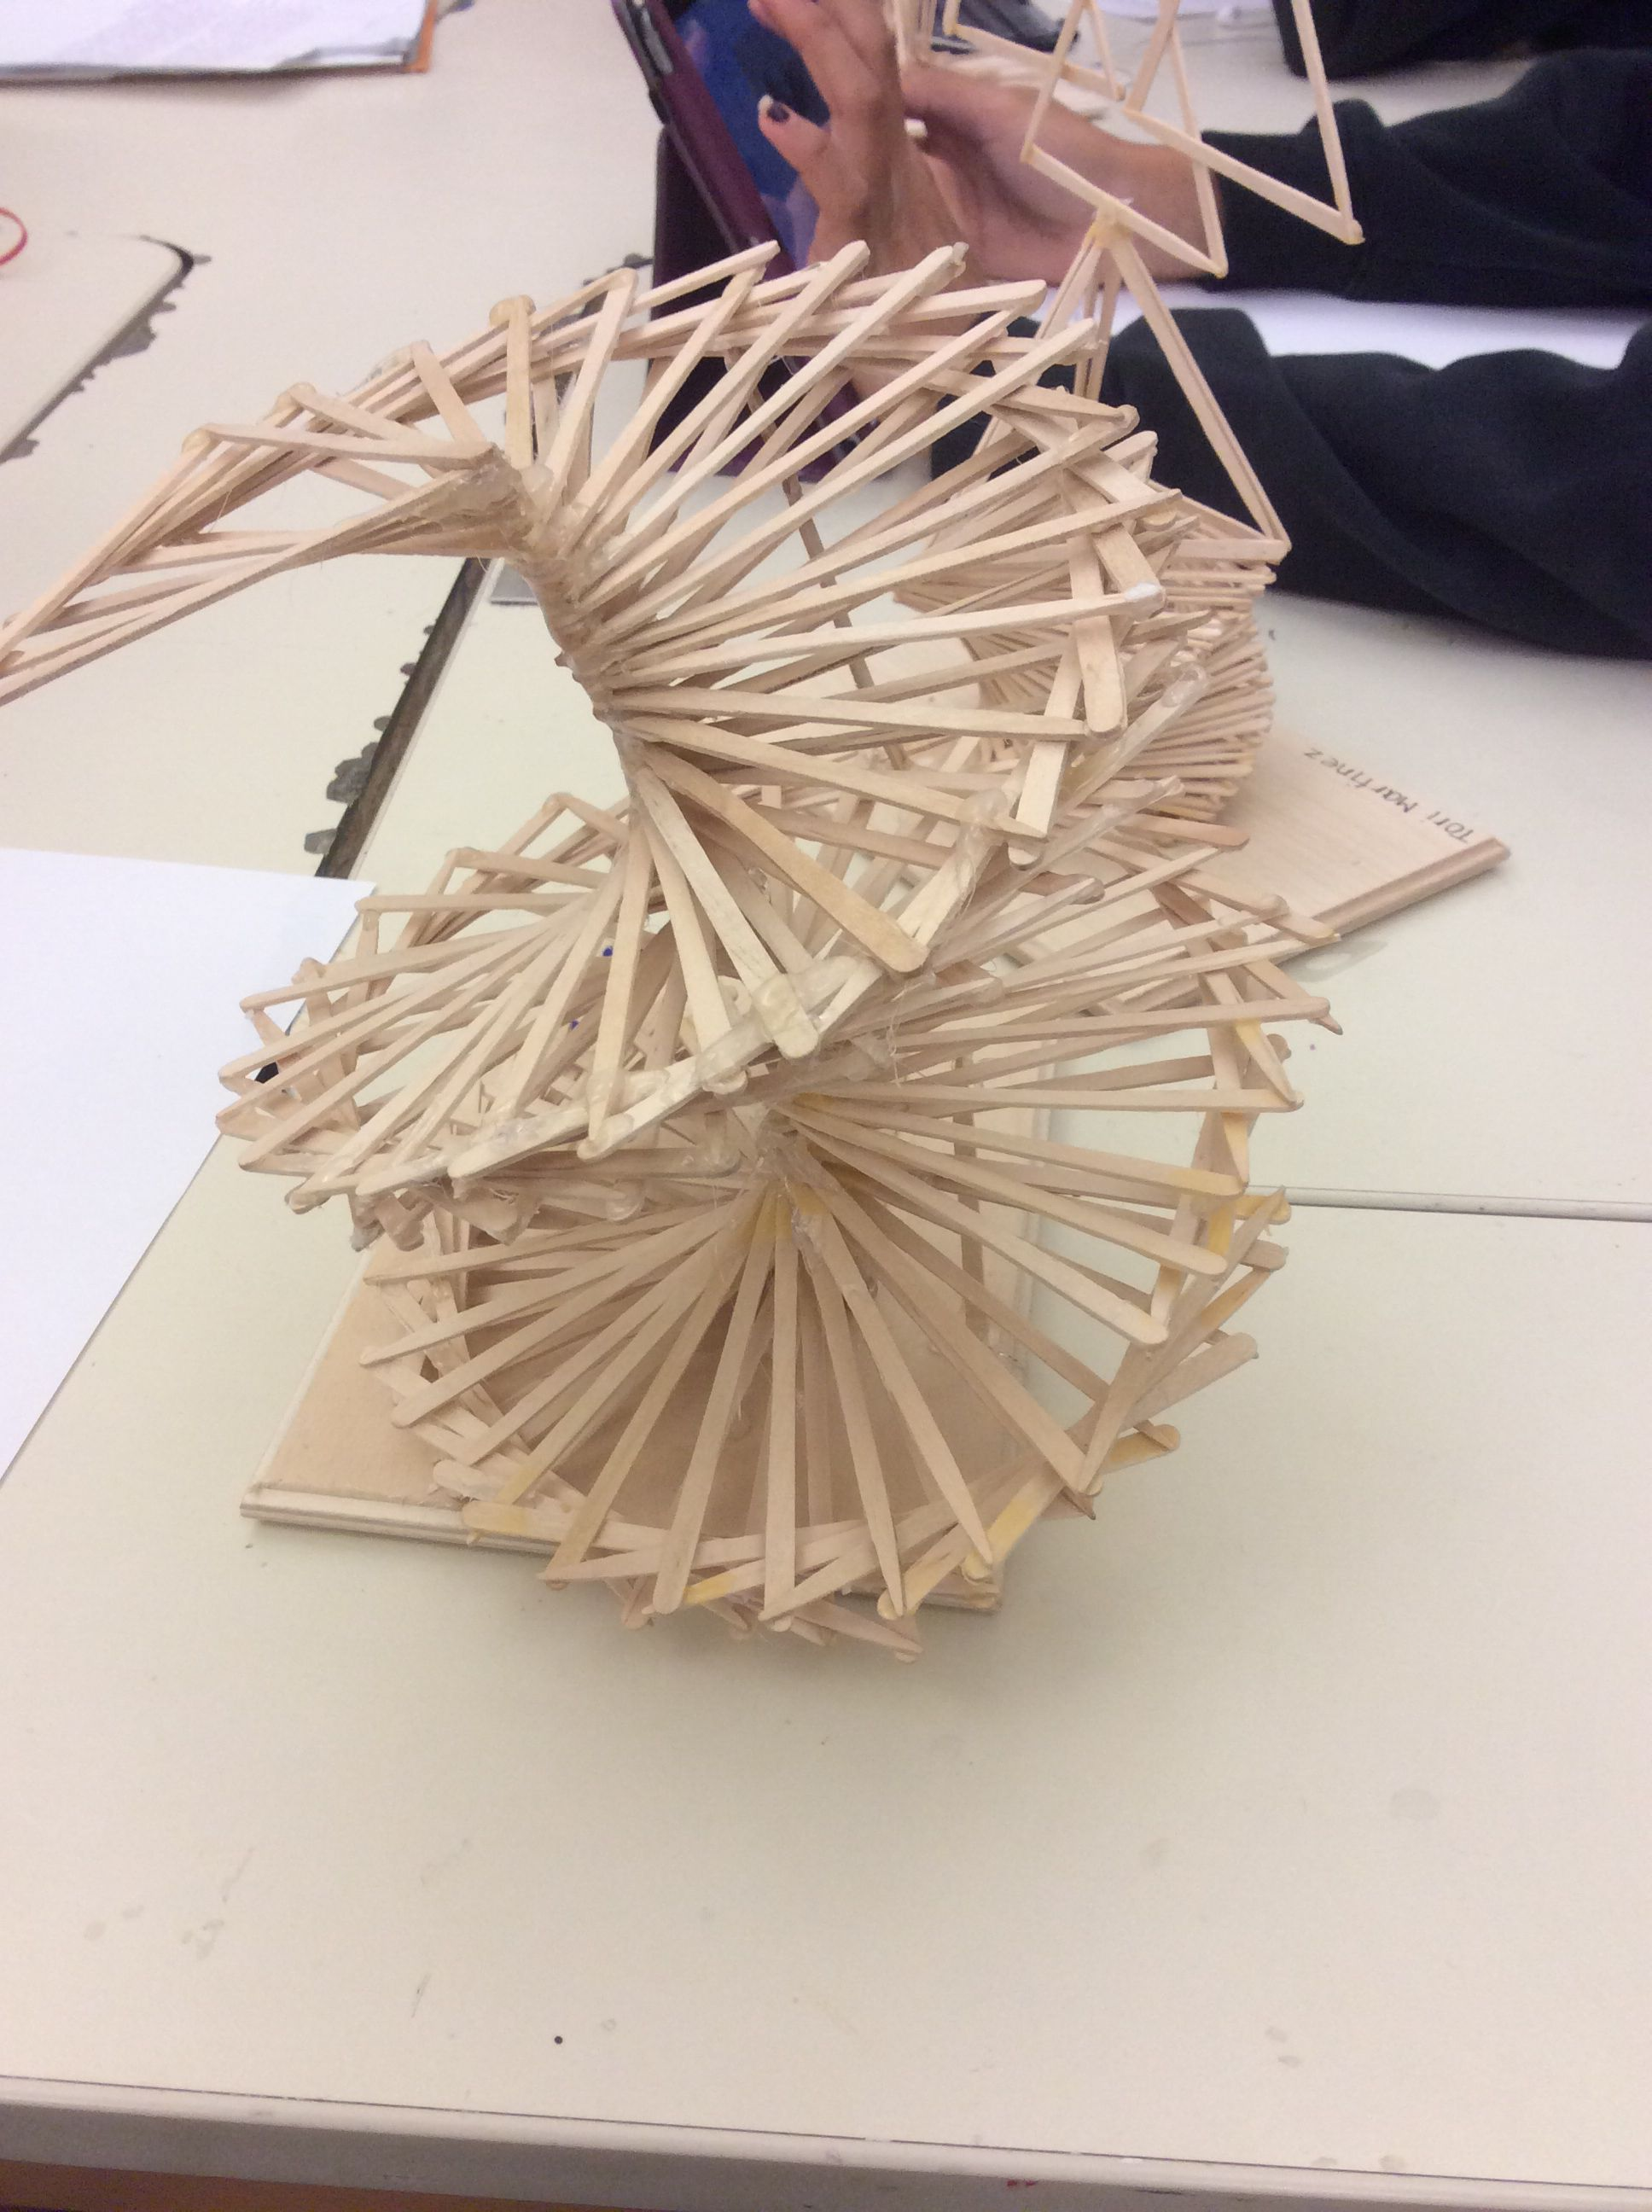 Make Art Design : Modular sculpture glue wooden sticks we had to make a